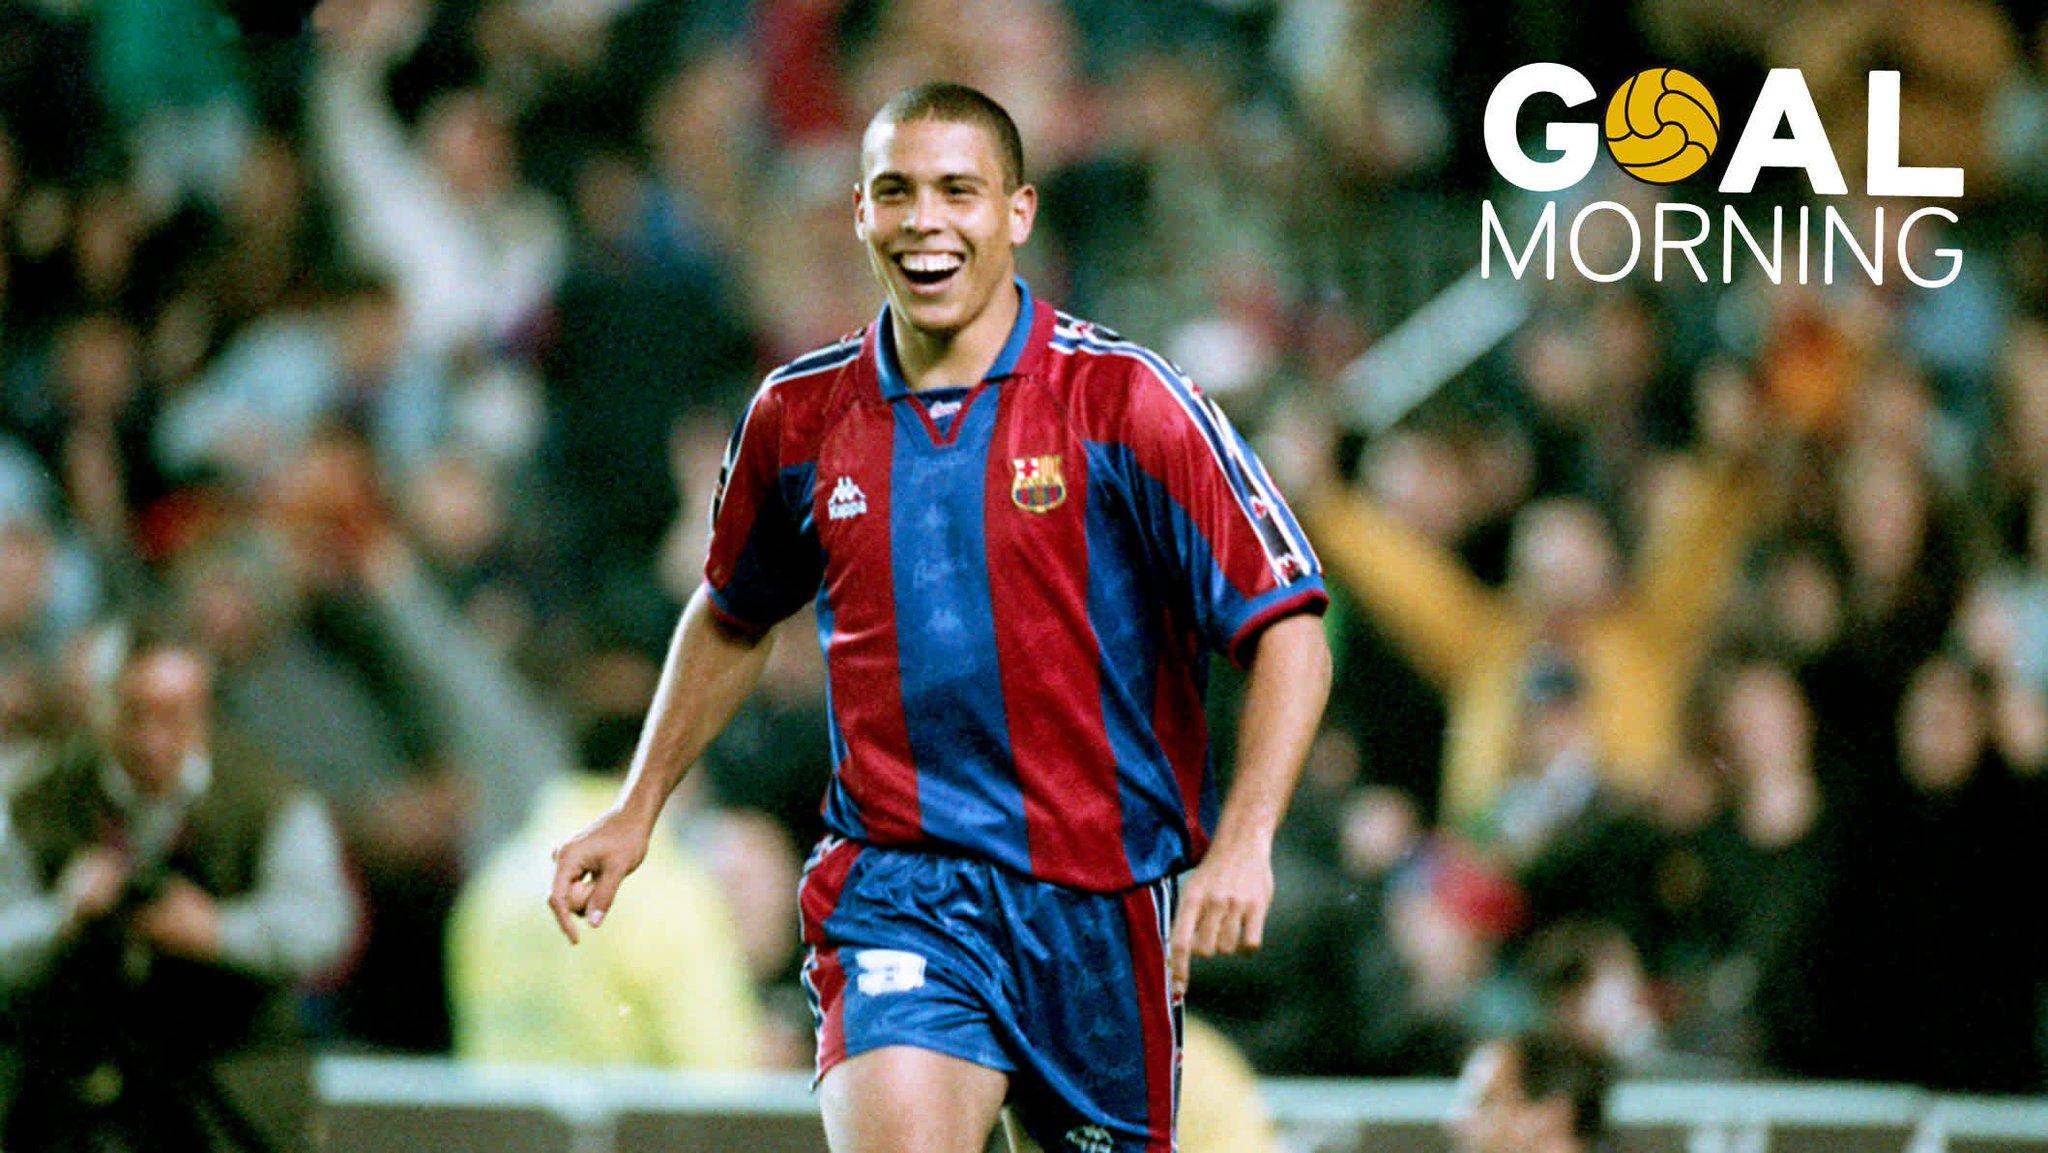 G⚽️AL MORNING!!! �� @Ronaldo  �� �� Valencia �� 1996 https://t.co/KlwVUq99u6